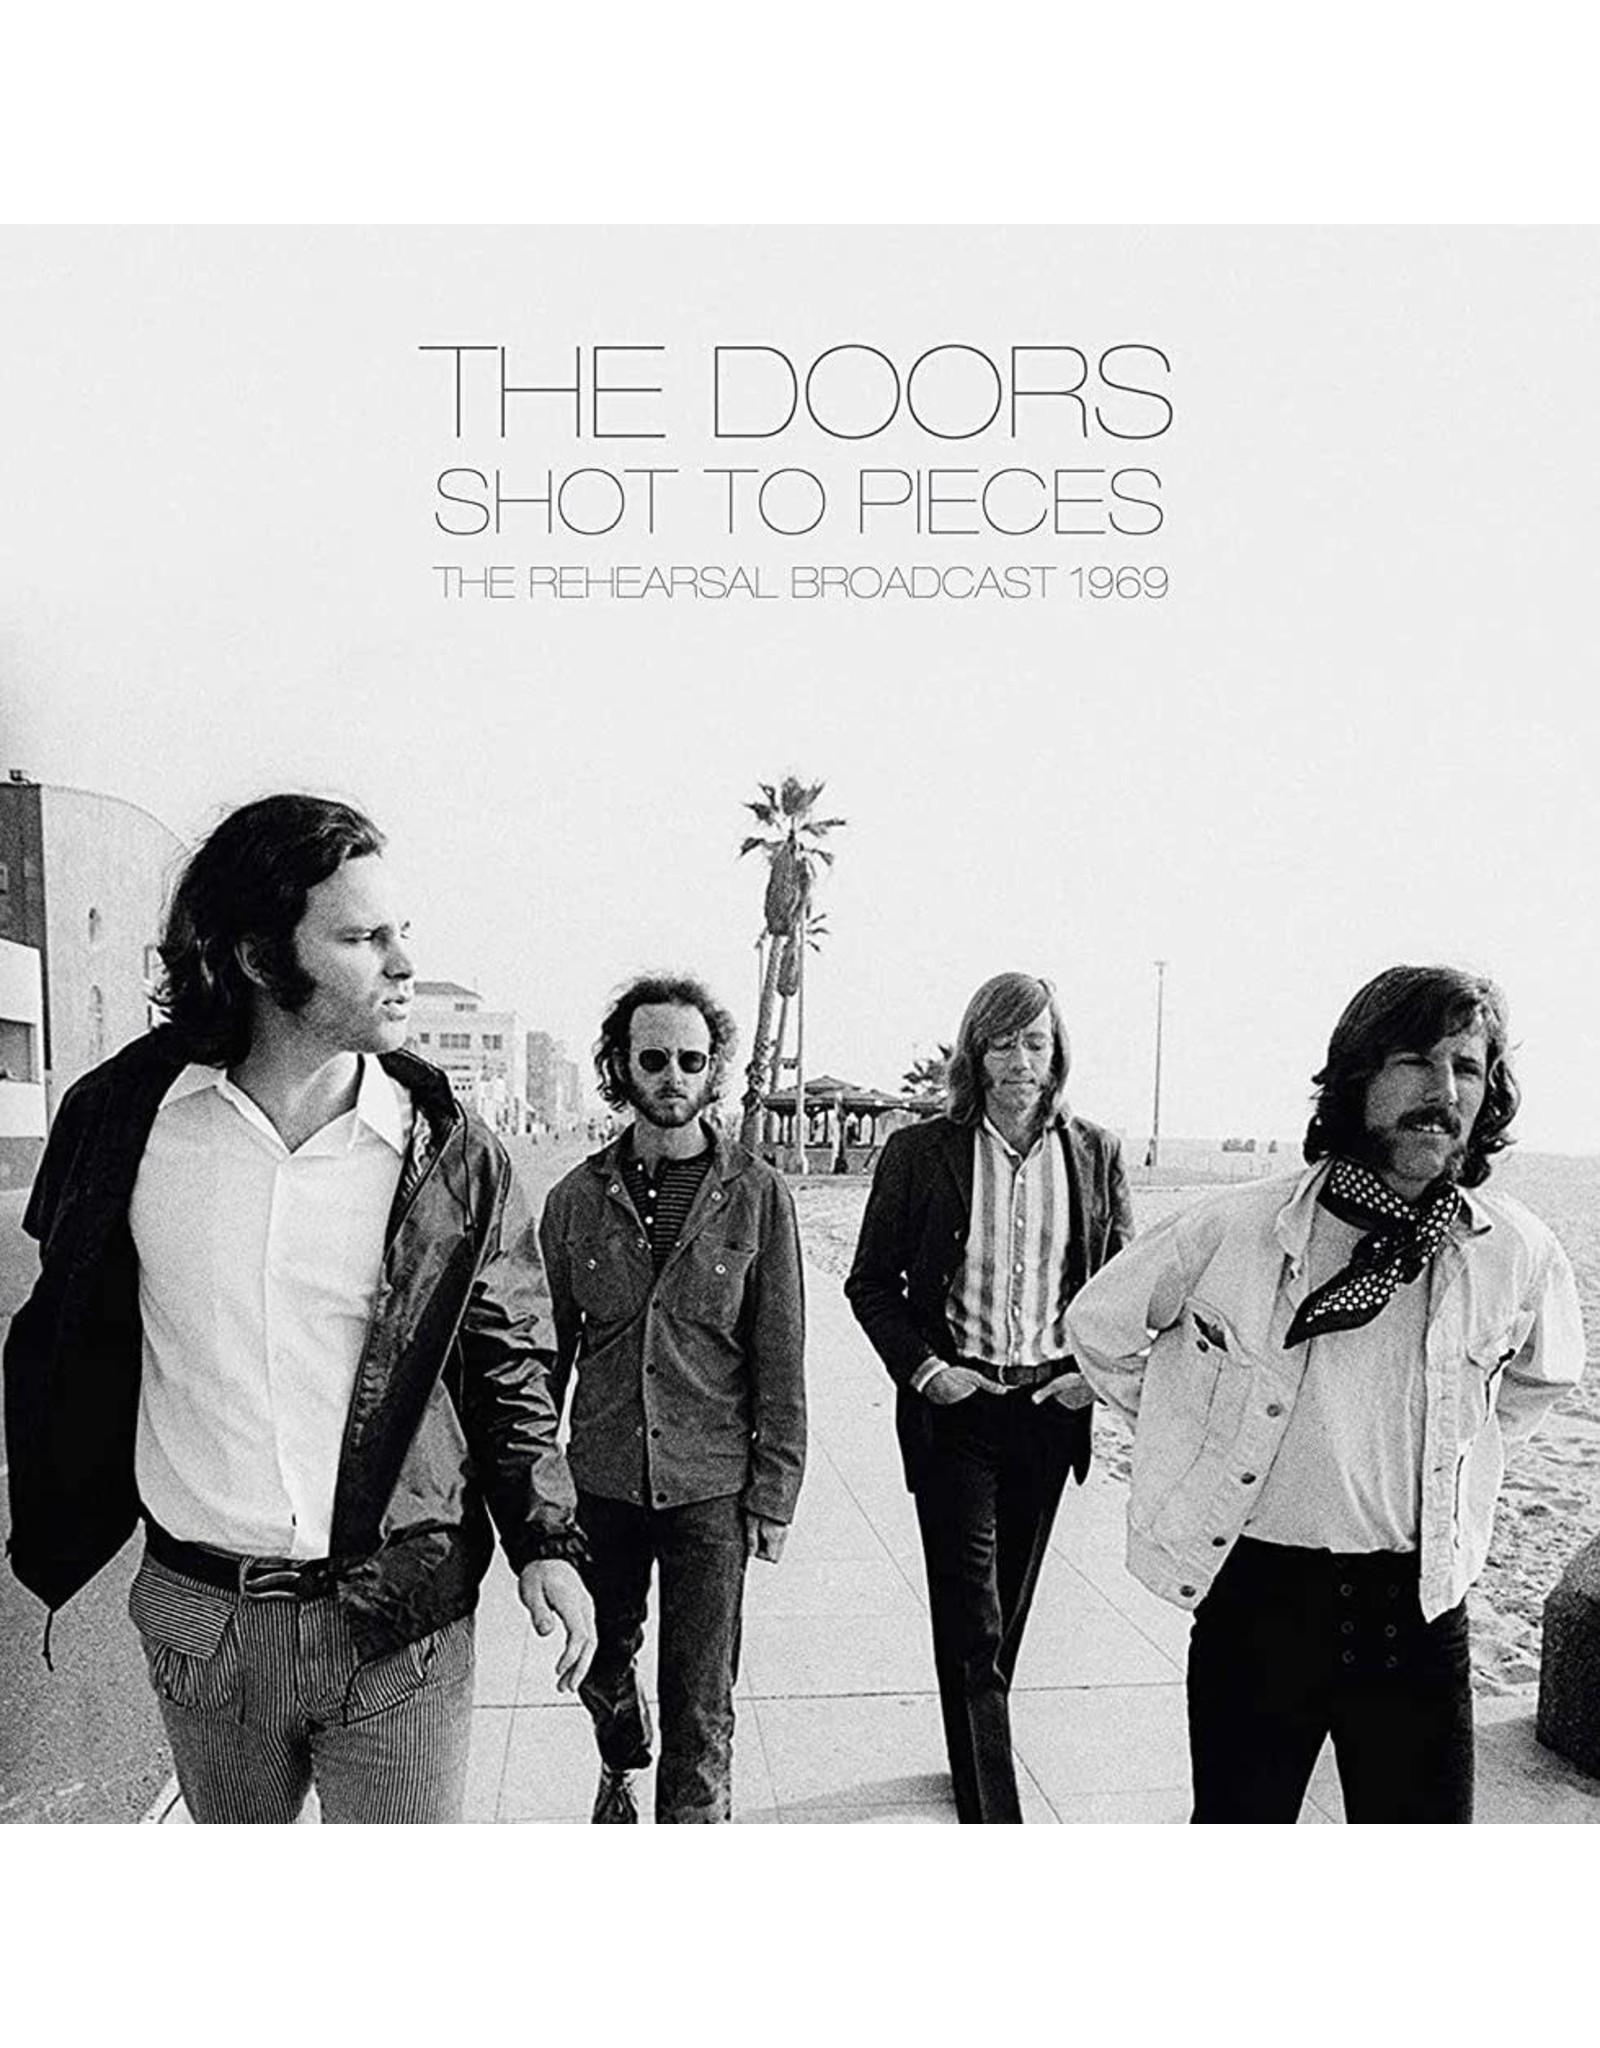 Vinyl The Doors - Shot To Pieces (1969 Rehearsal Broadcast)